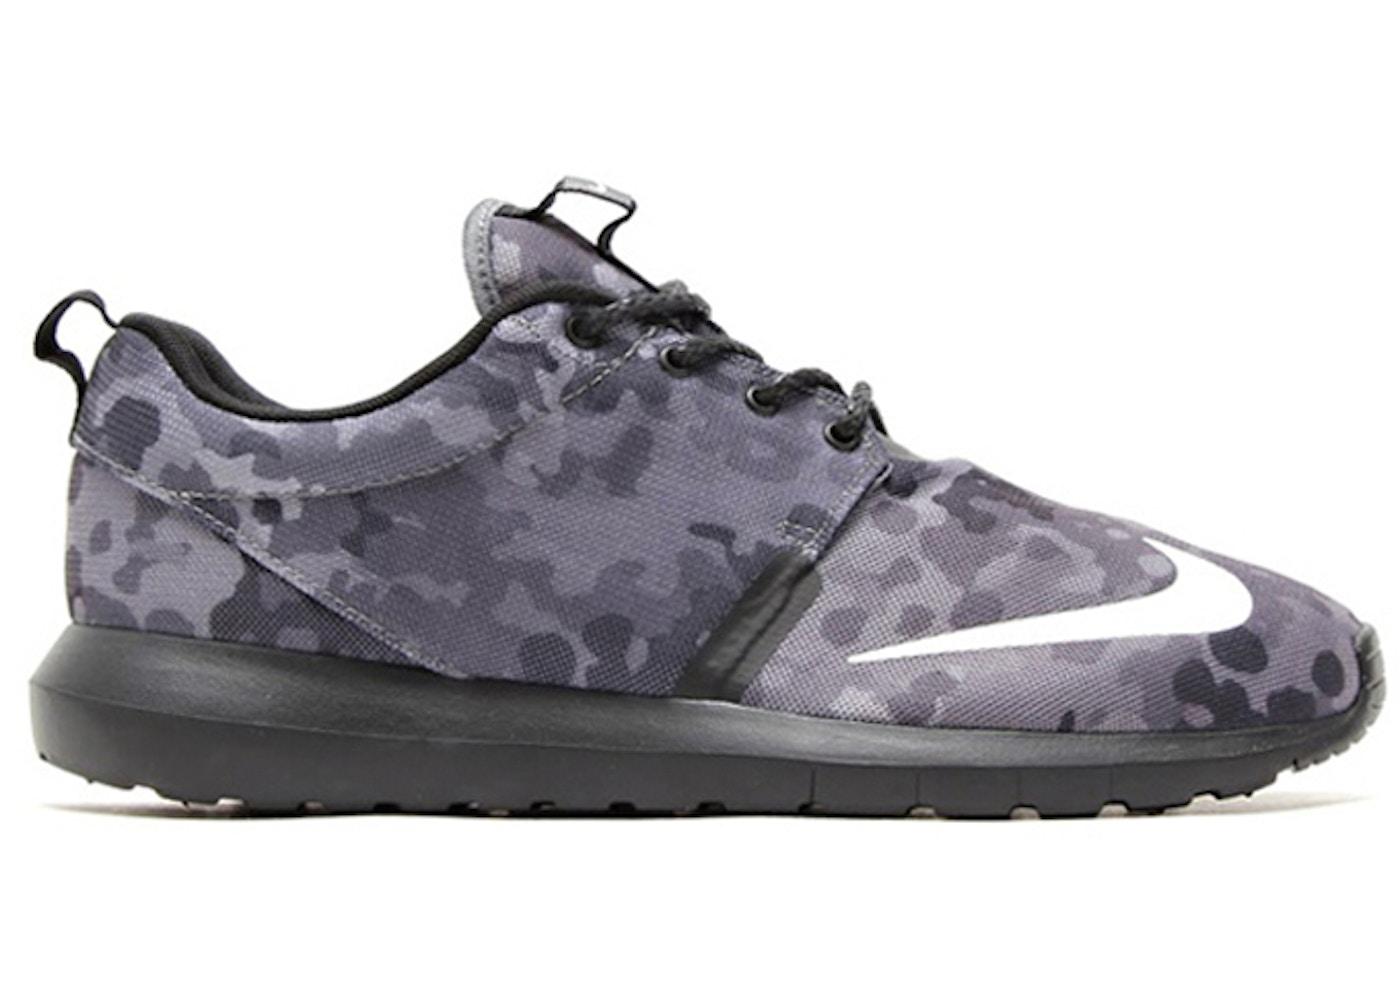 new style 45456 60cc0 Nike Roshe Run Dark Grey Camo - 685196-001